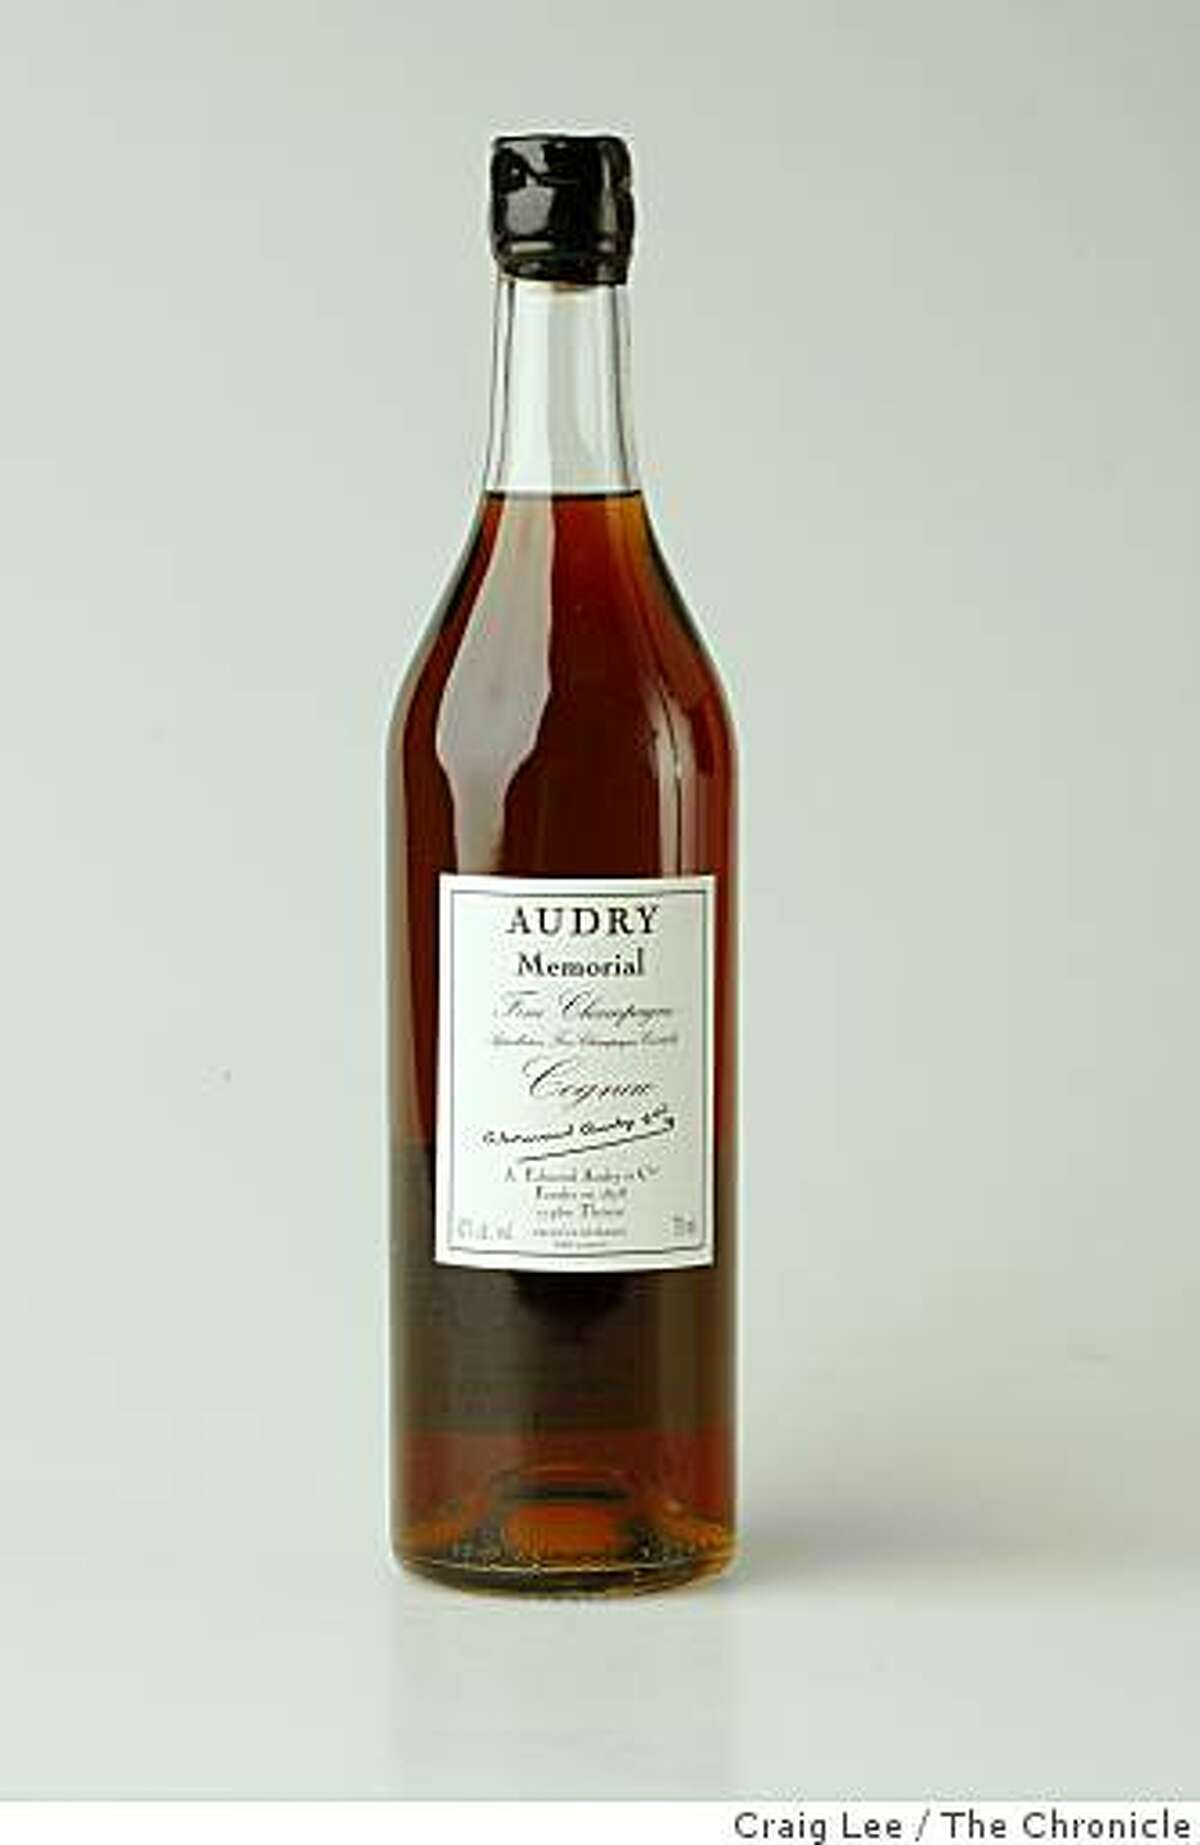 Audry Memorial Fine Champagne , in San Francisco, Calif., on November 21, 2008.